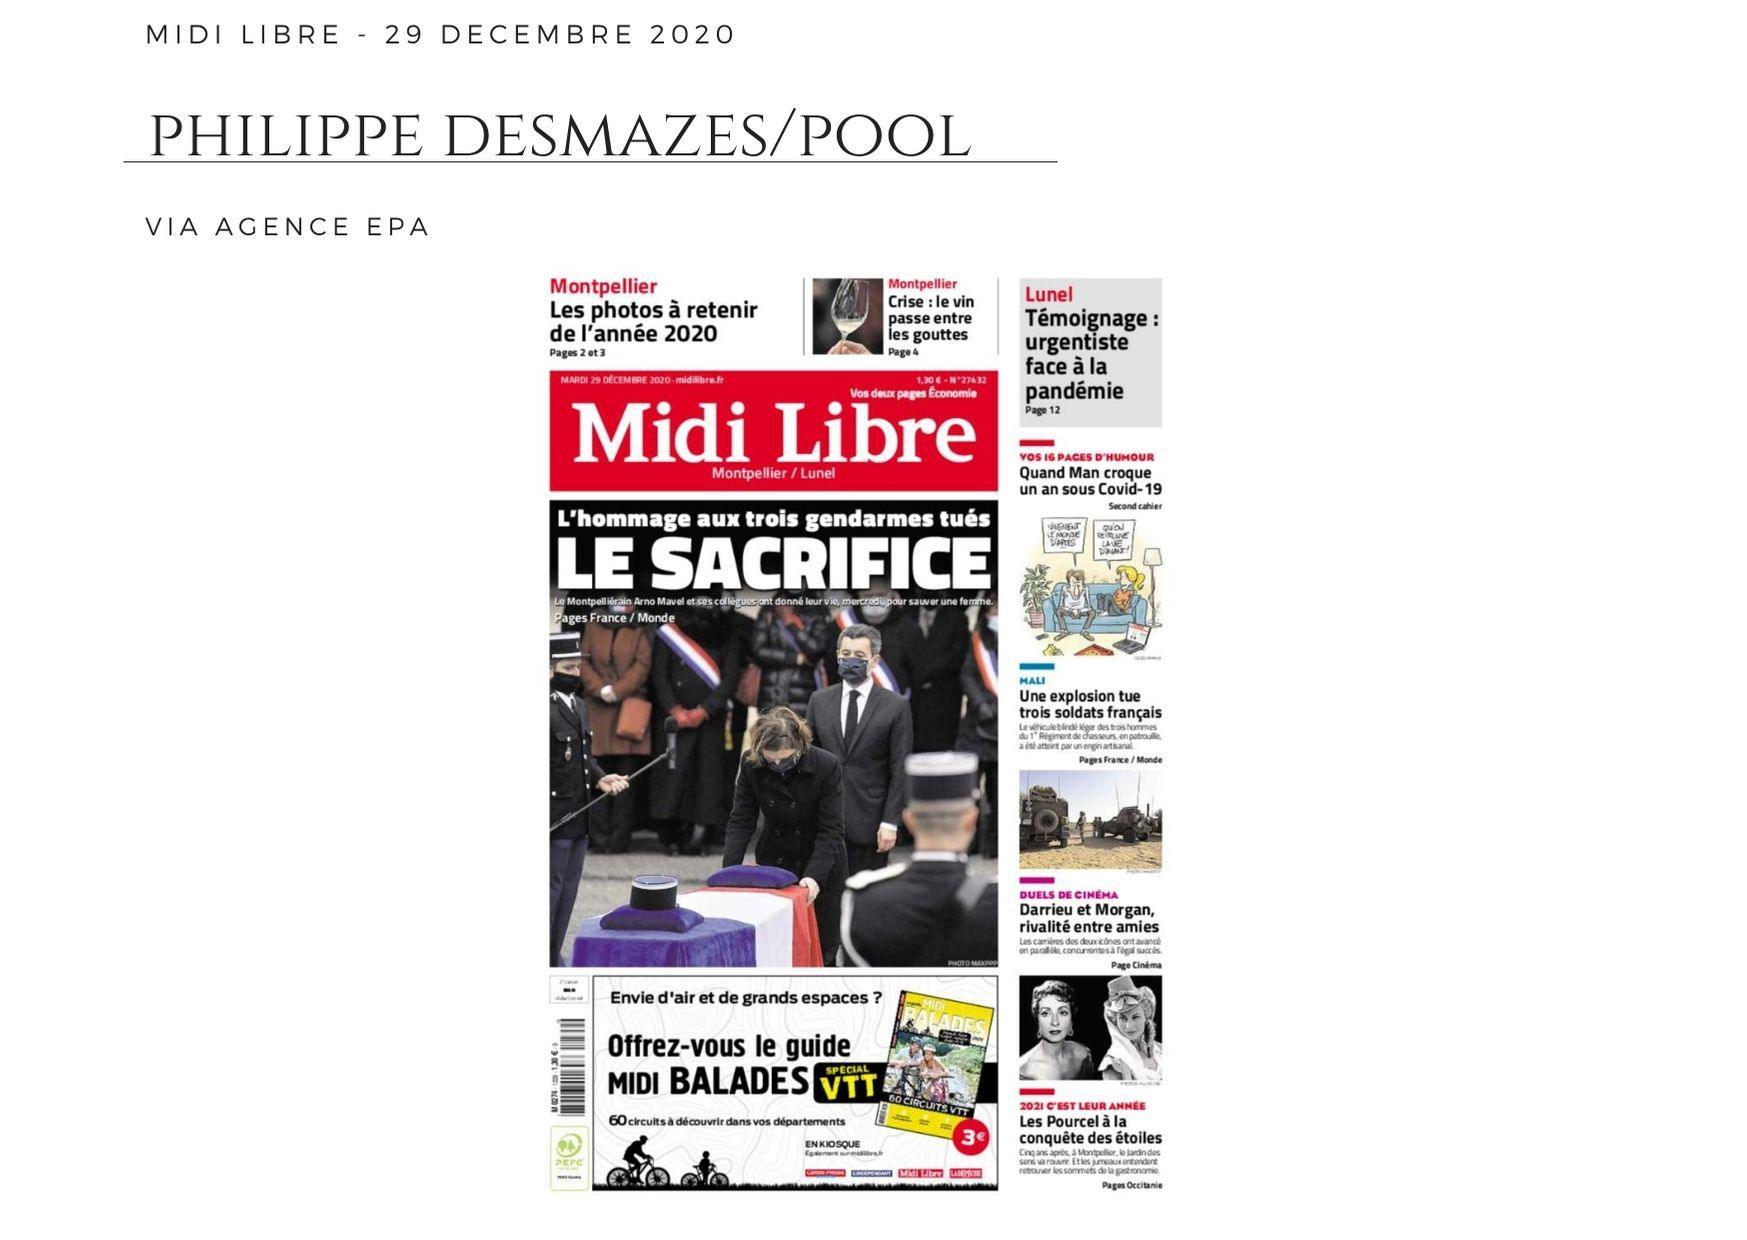 Midi Libre - 29 décembre 2020